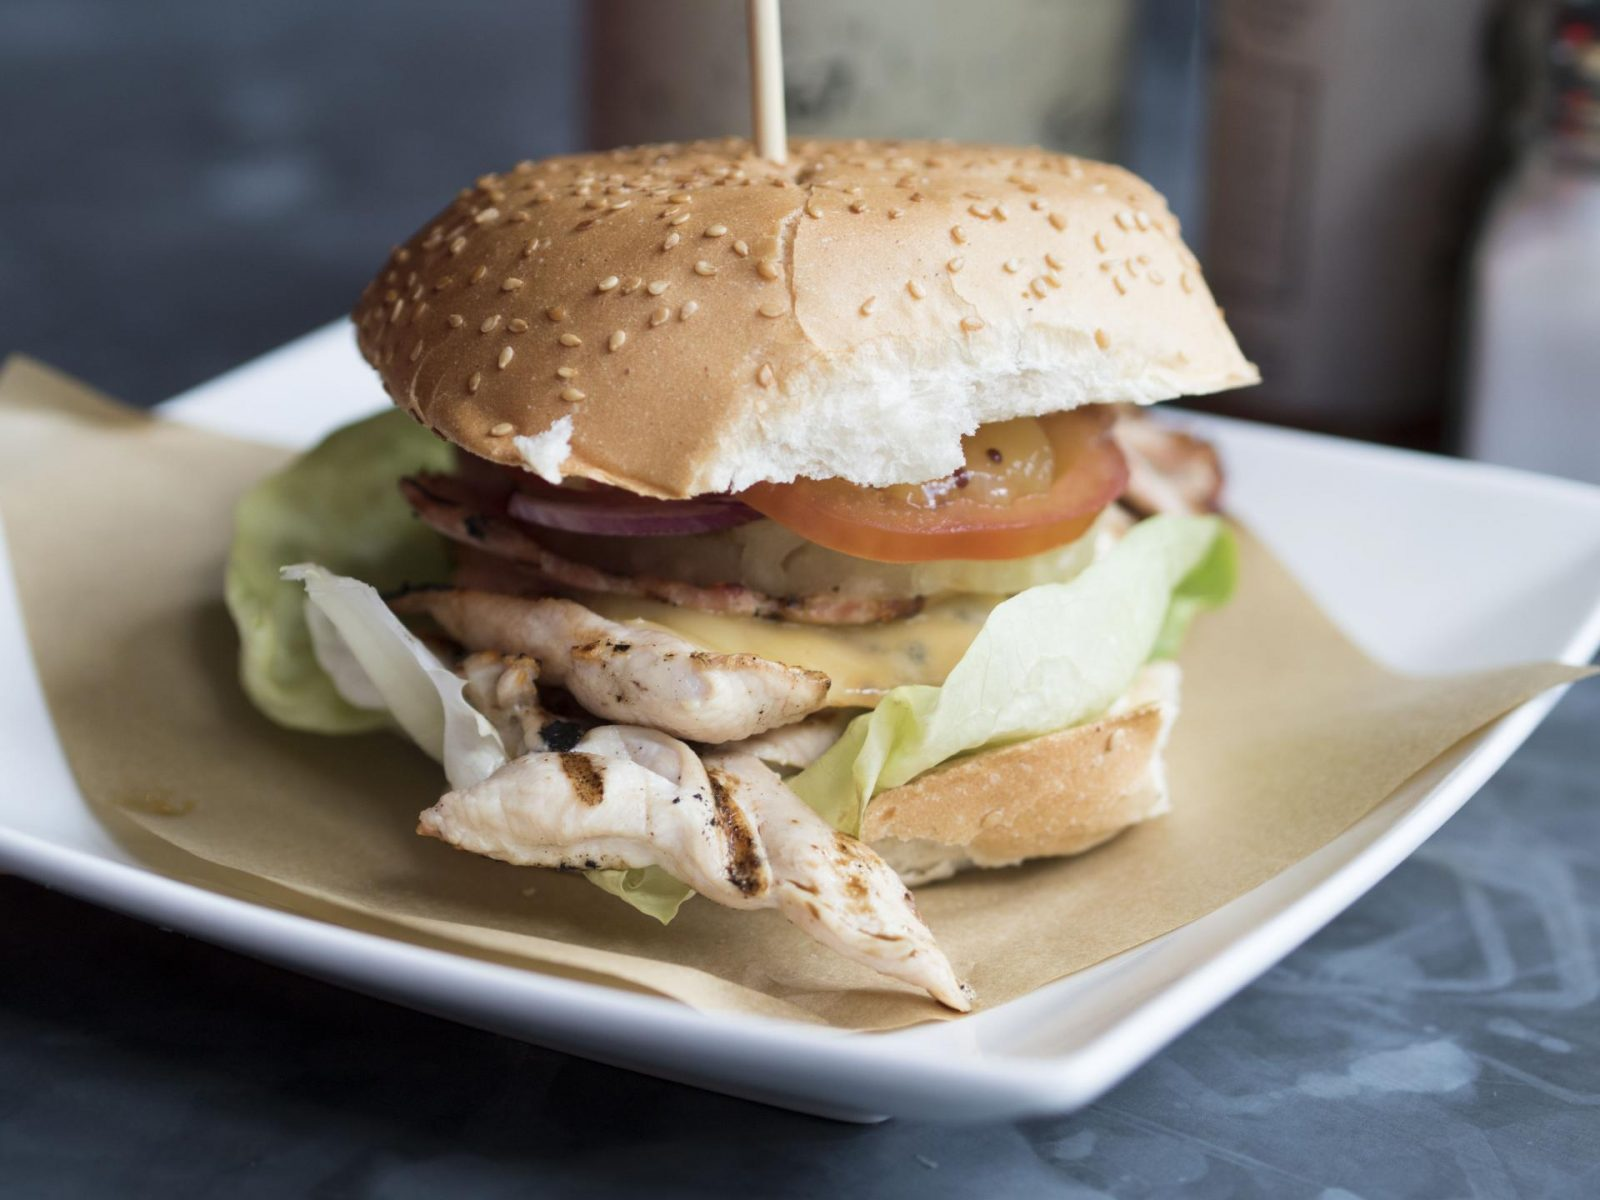 Handmade-Burger-Co-and-Tamu-Dessert Lounge- (7)